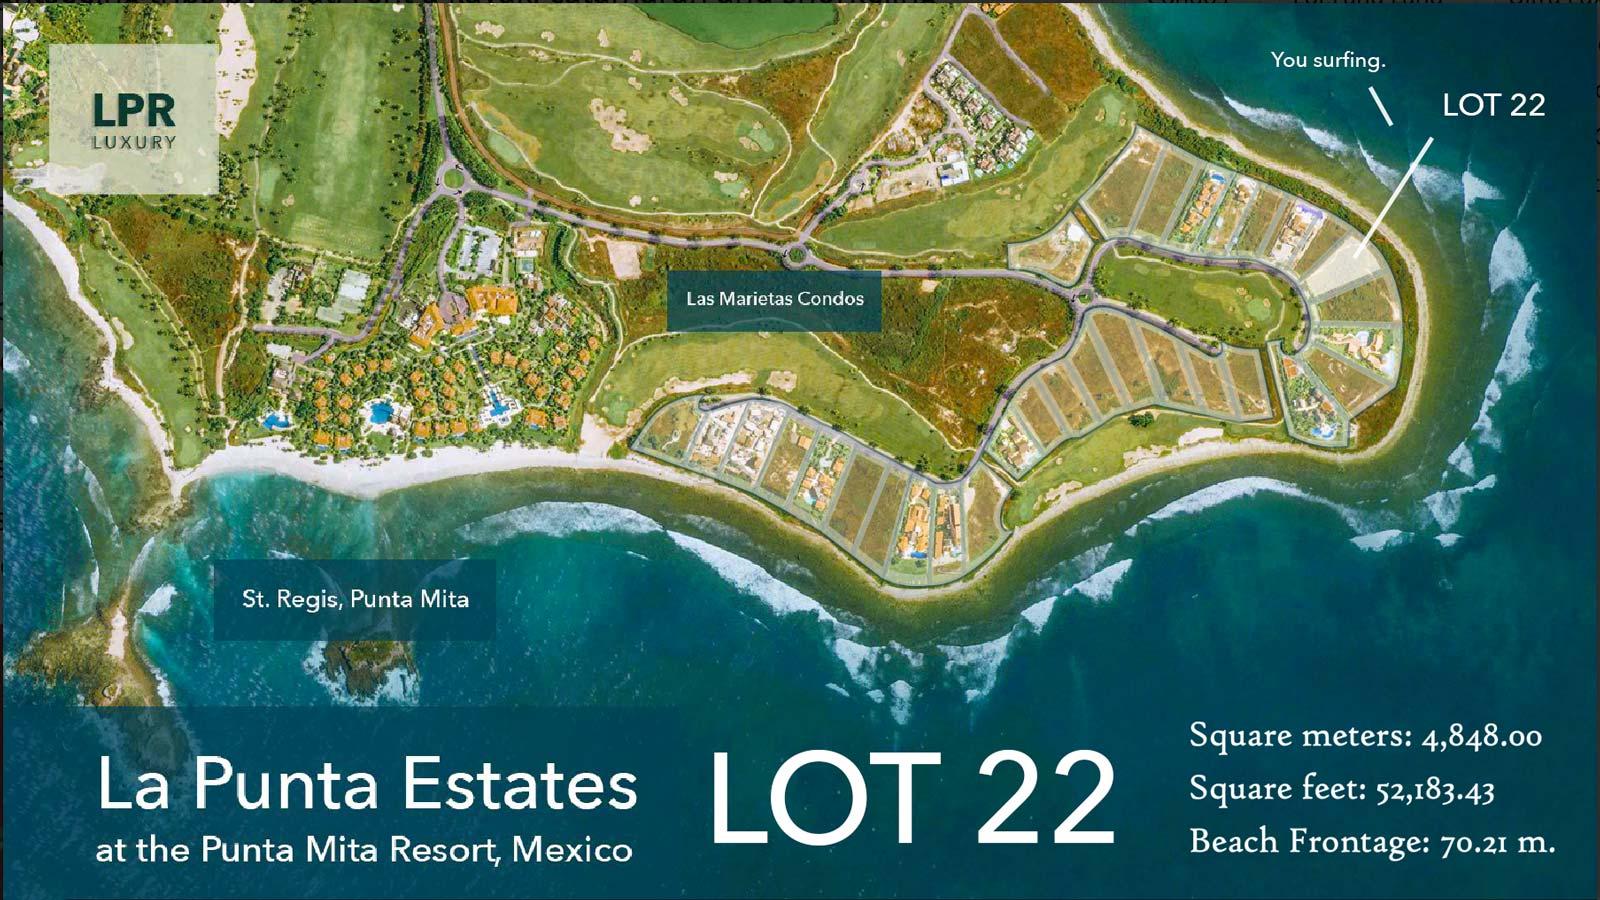 La Punta Estates - Lot 22 at the exclusive Punta Mita Resort, Riviera Nayarit, Mexico